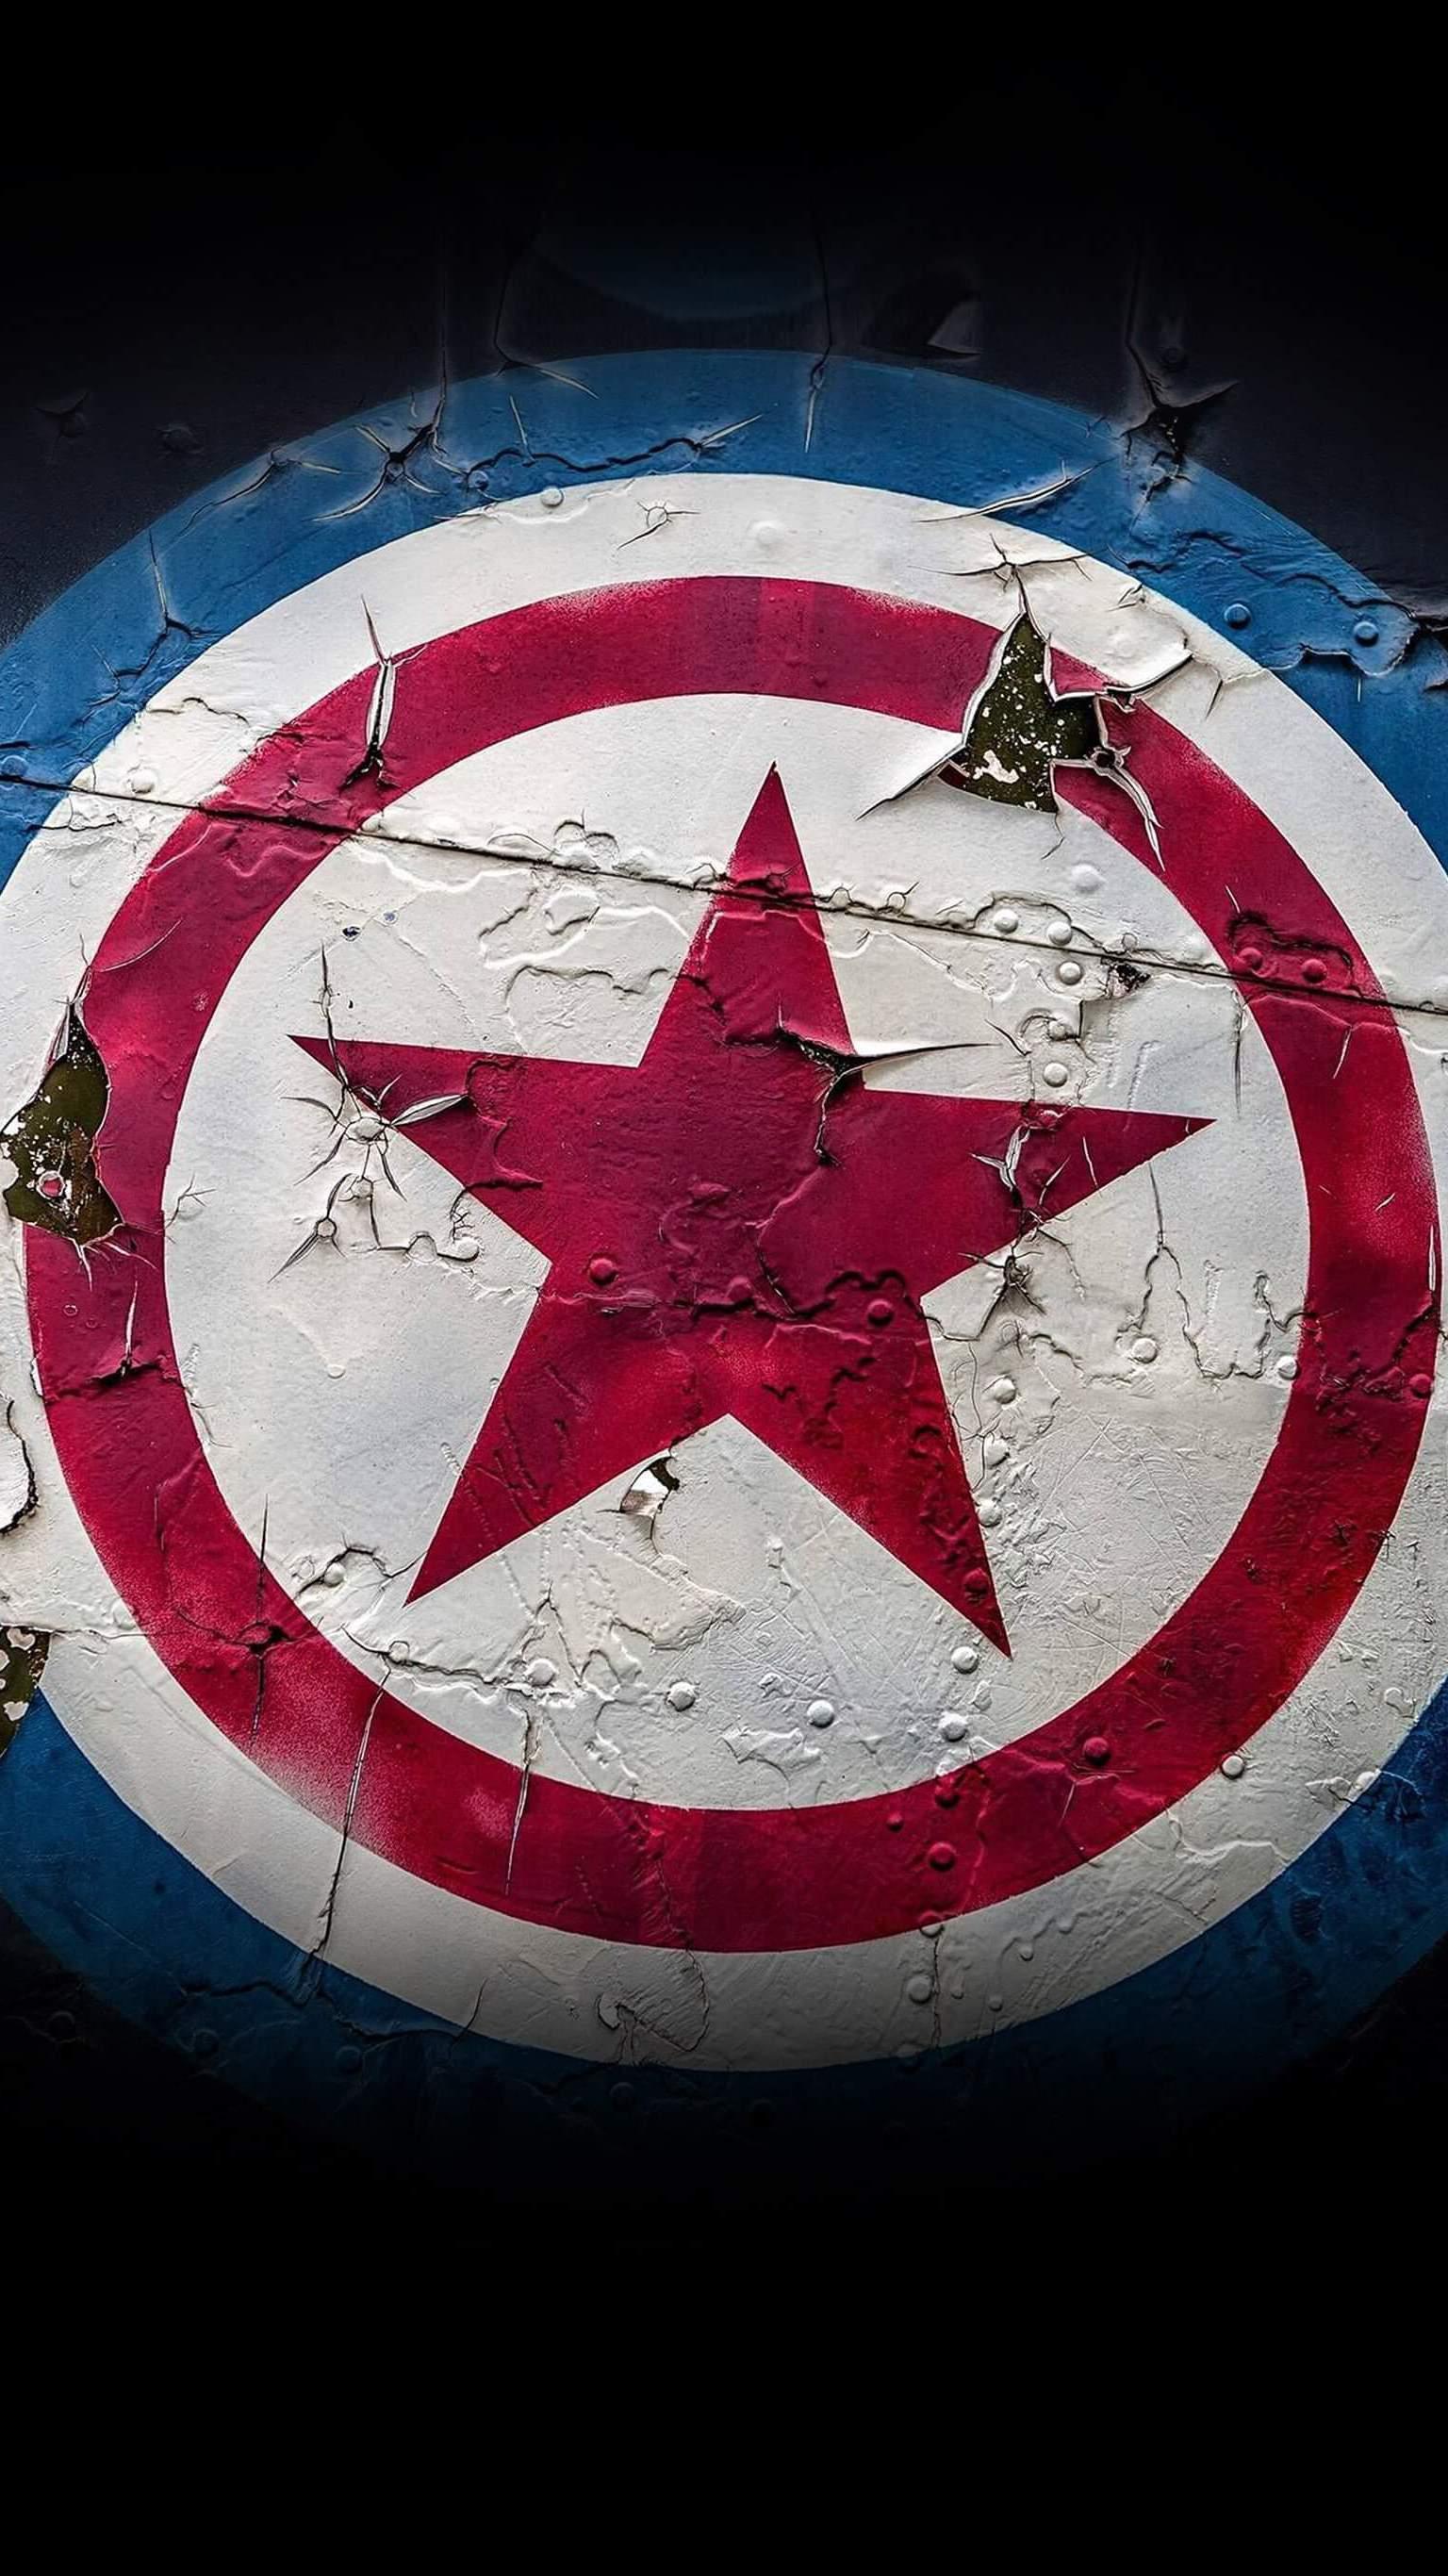 Cute Iphone Christmas Wallpapers Captain America Marvel Hero Iphone Wallpaper Iphone